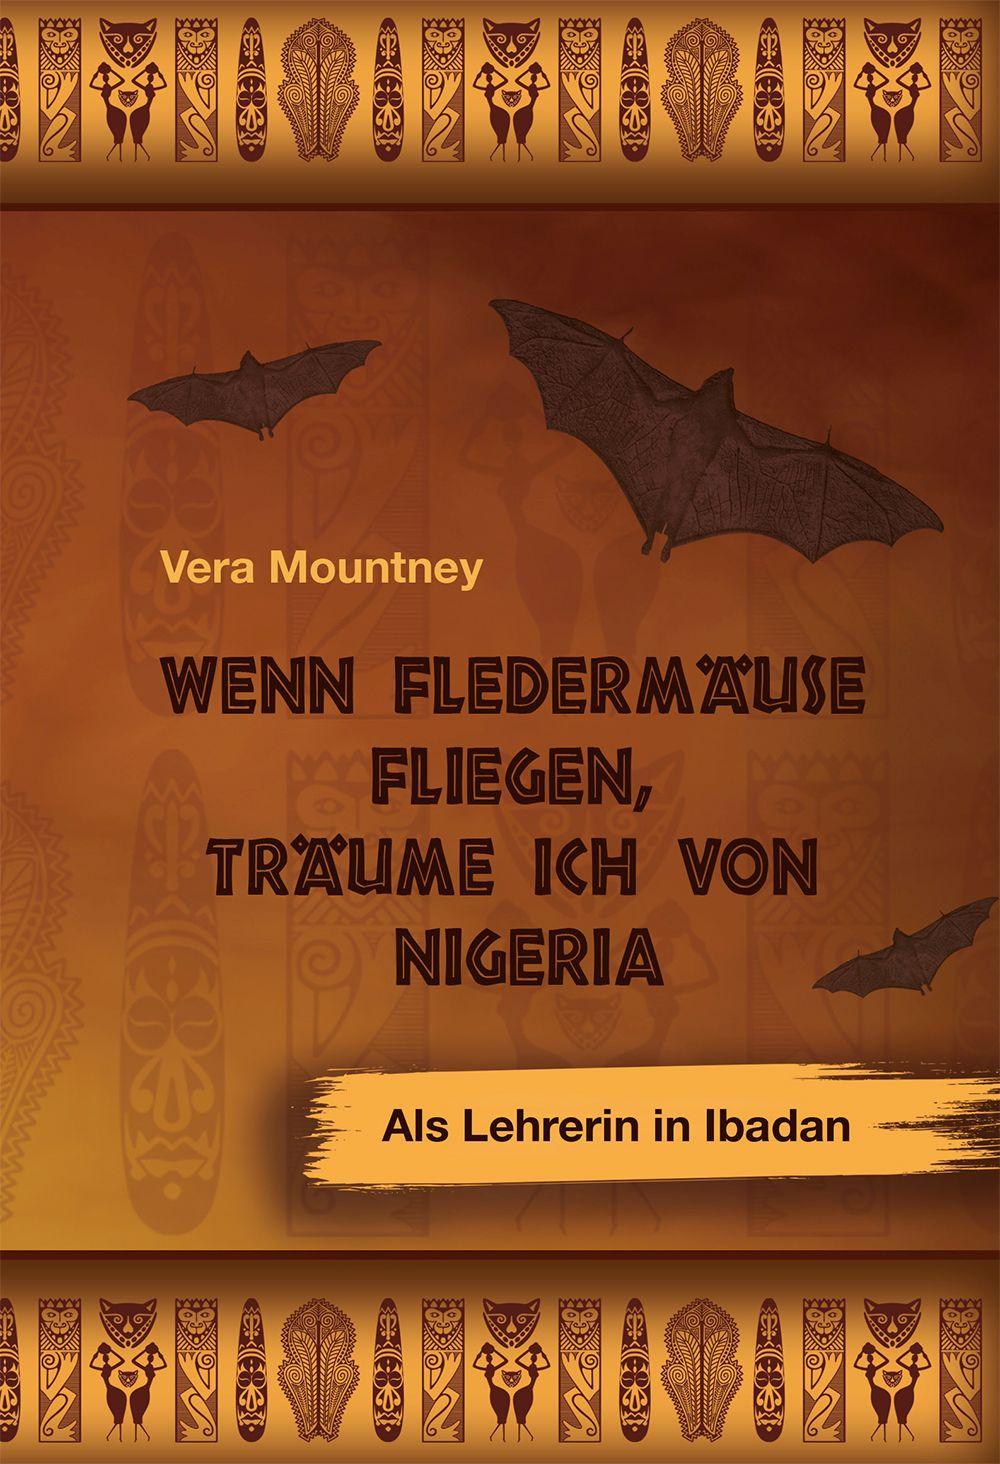 Afrika News & Afrika Infos & Afrika Tipps @ Afrika-123.de | Verlag Kern